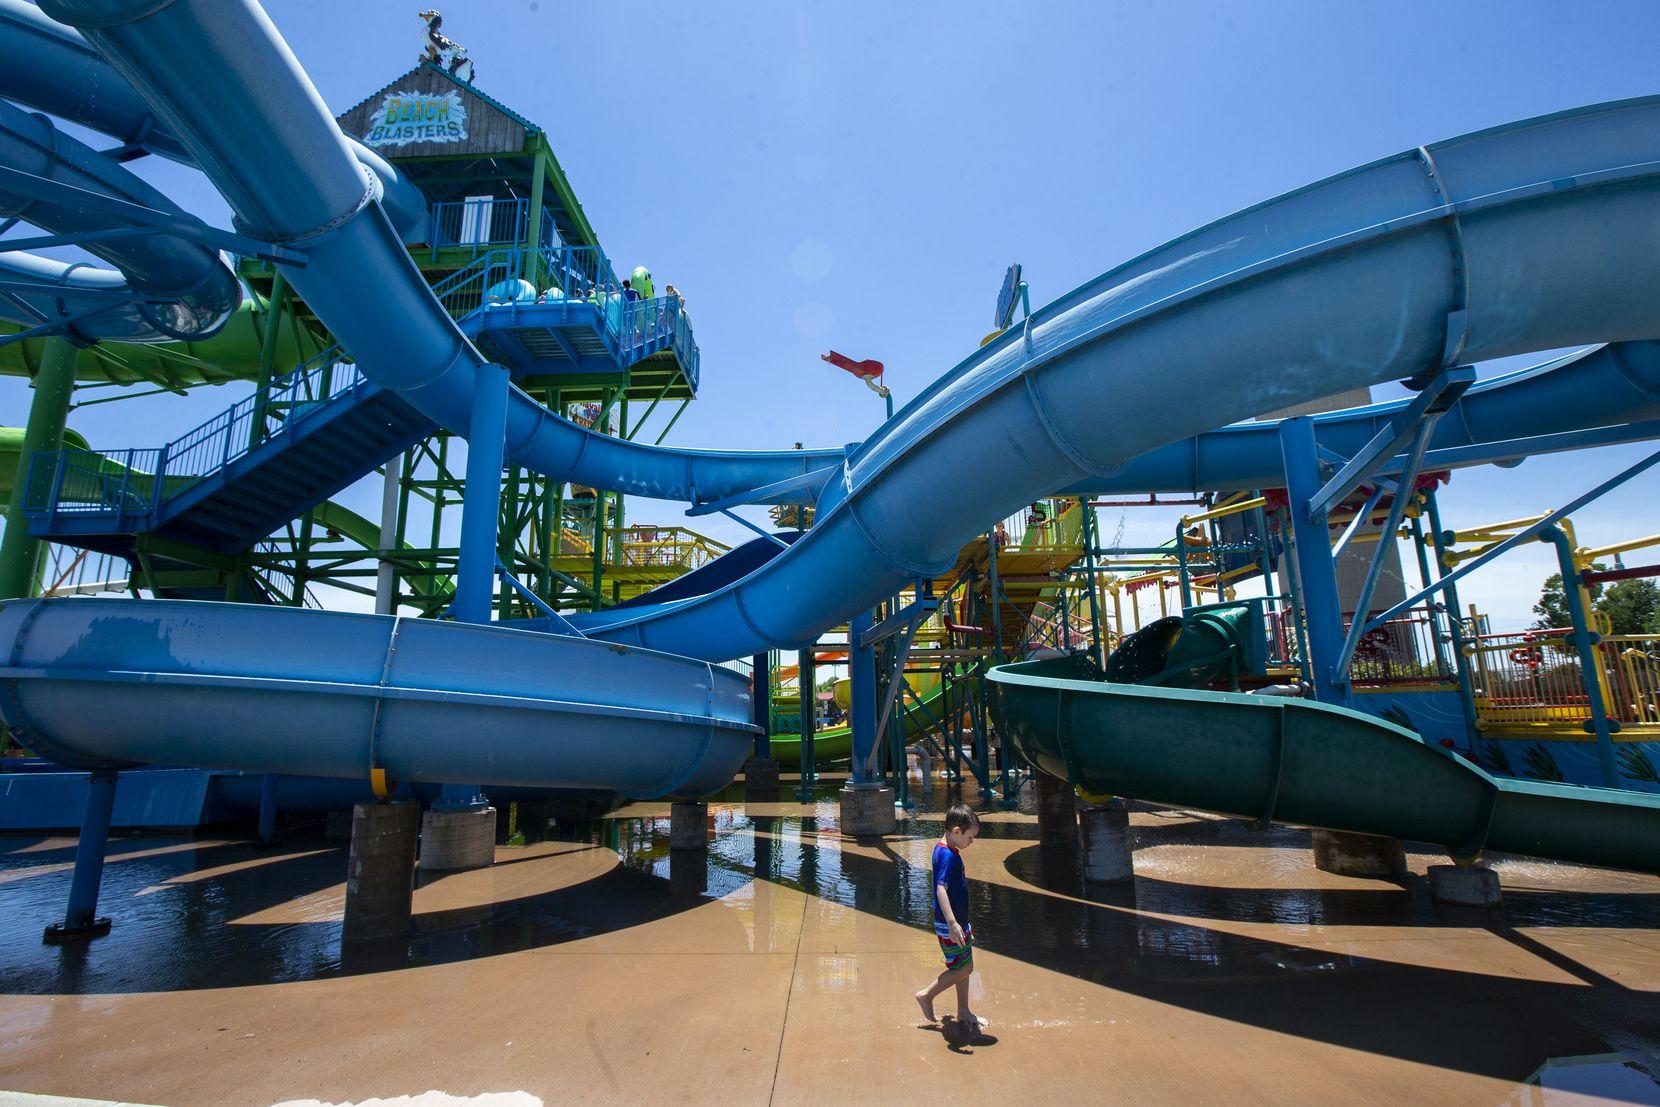 In a taste of summertime fun, children enjoy the water attractions at Hawaiian Falls water park in Roanoke.